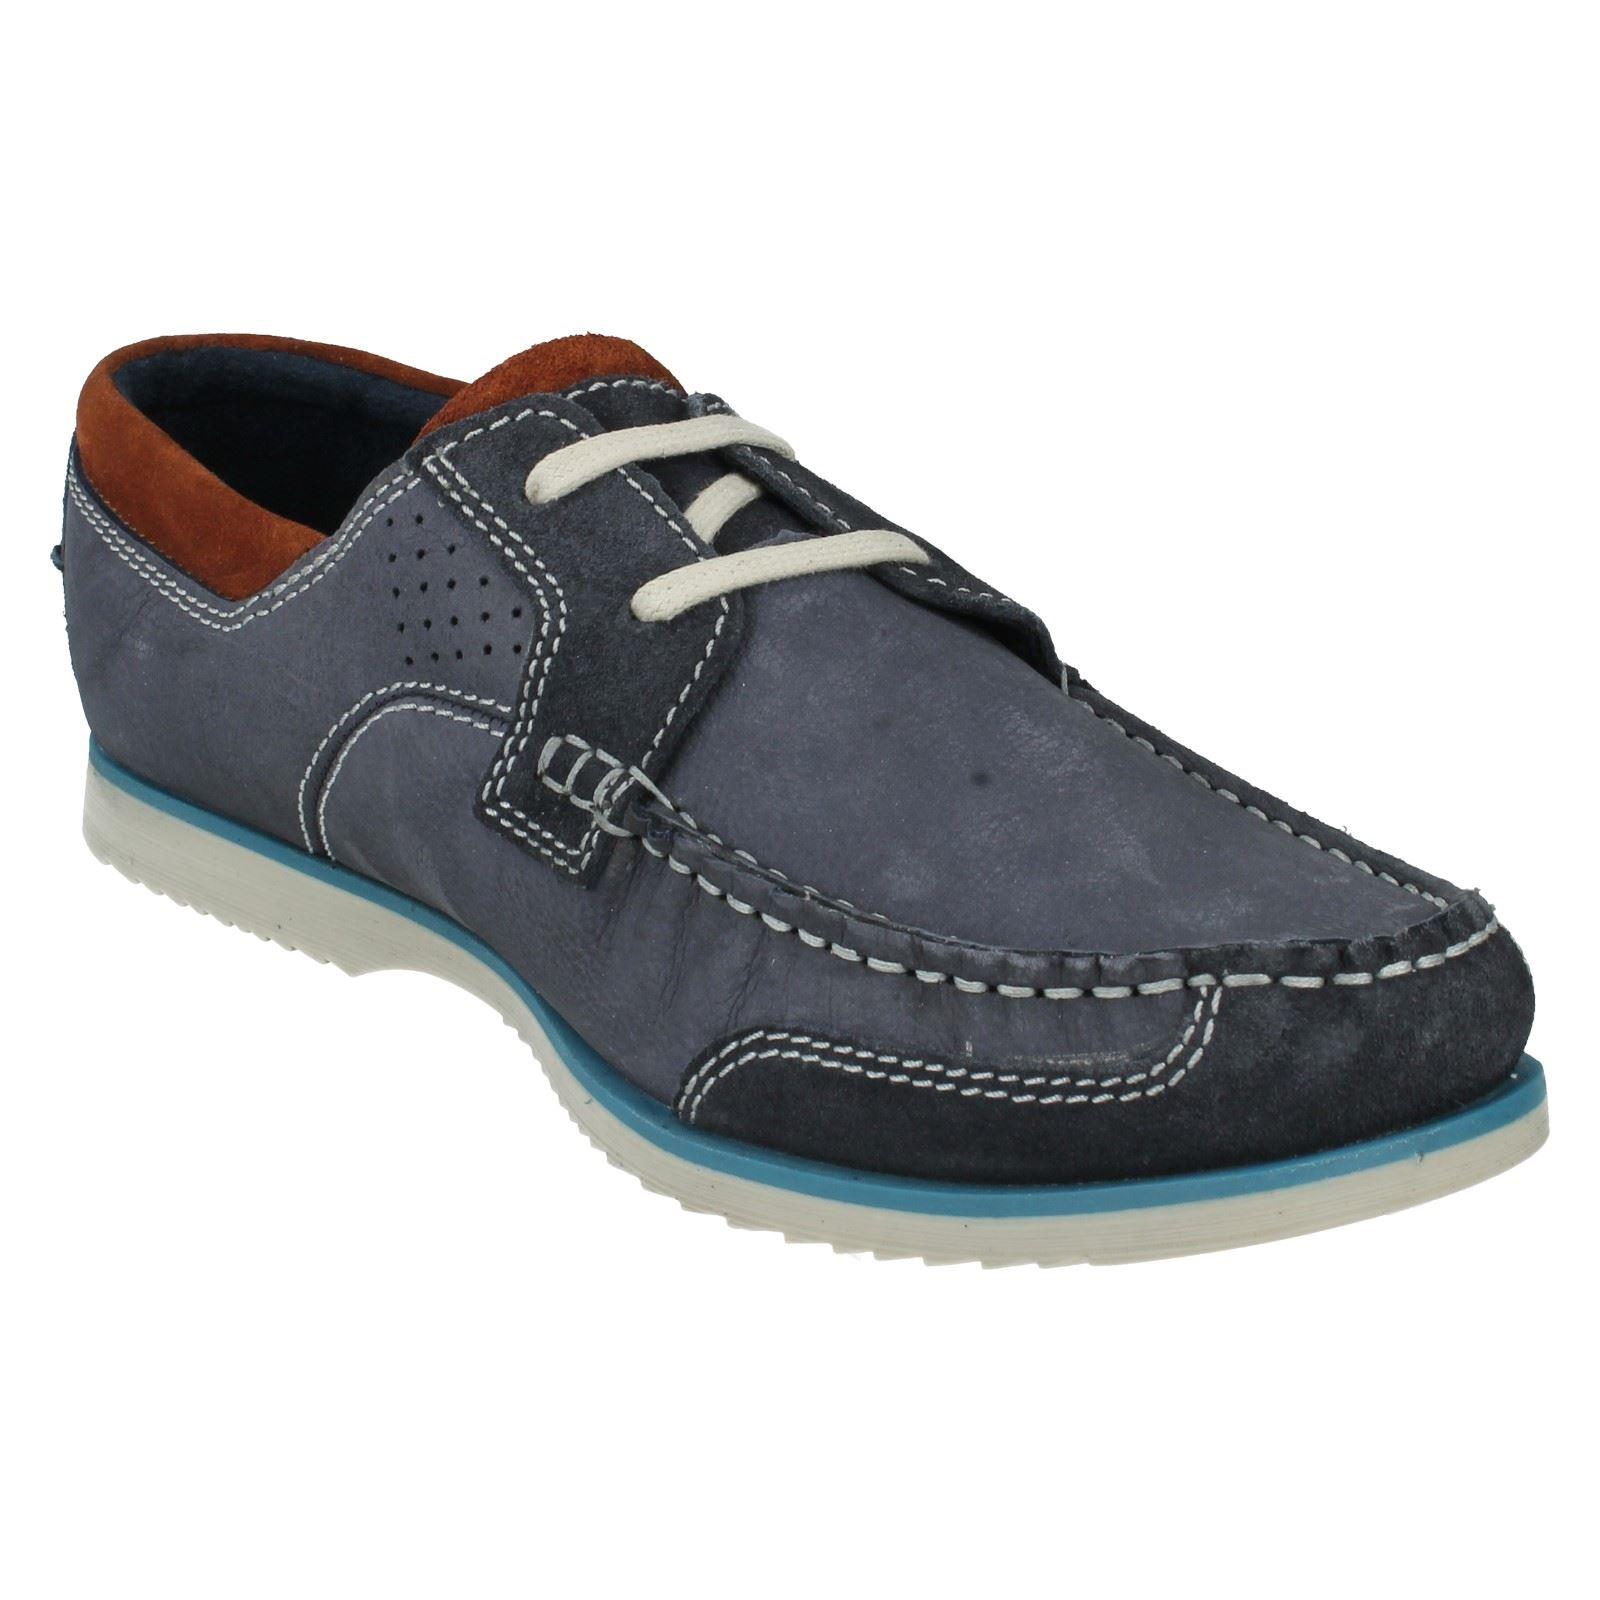 Mens Clarks Boat Shoes Label Kendrick Sail -W -W Sail 549ba5